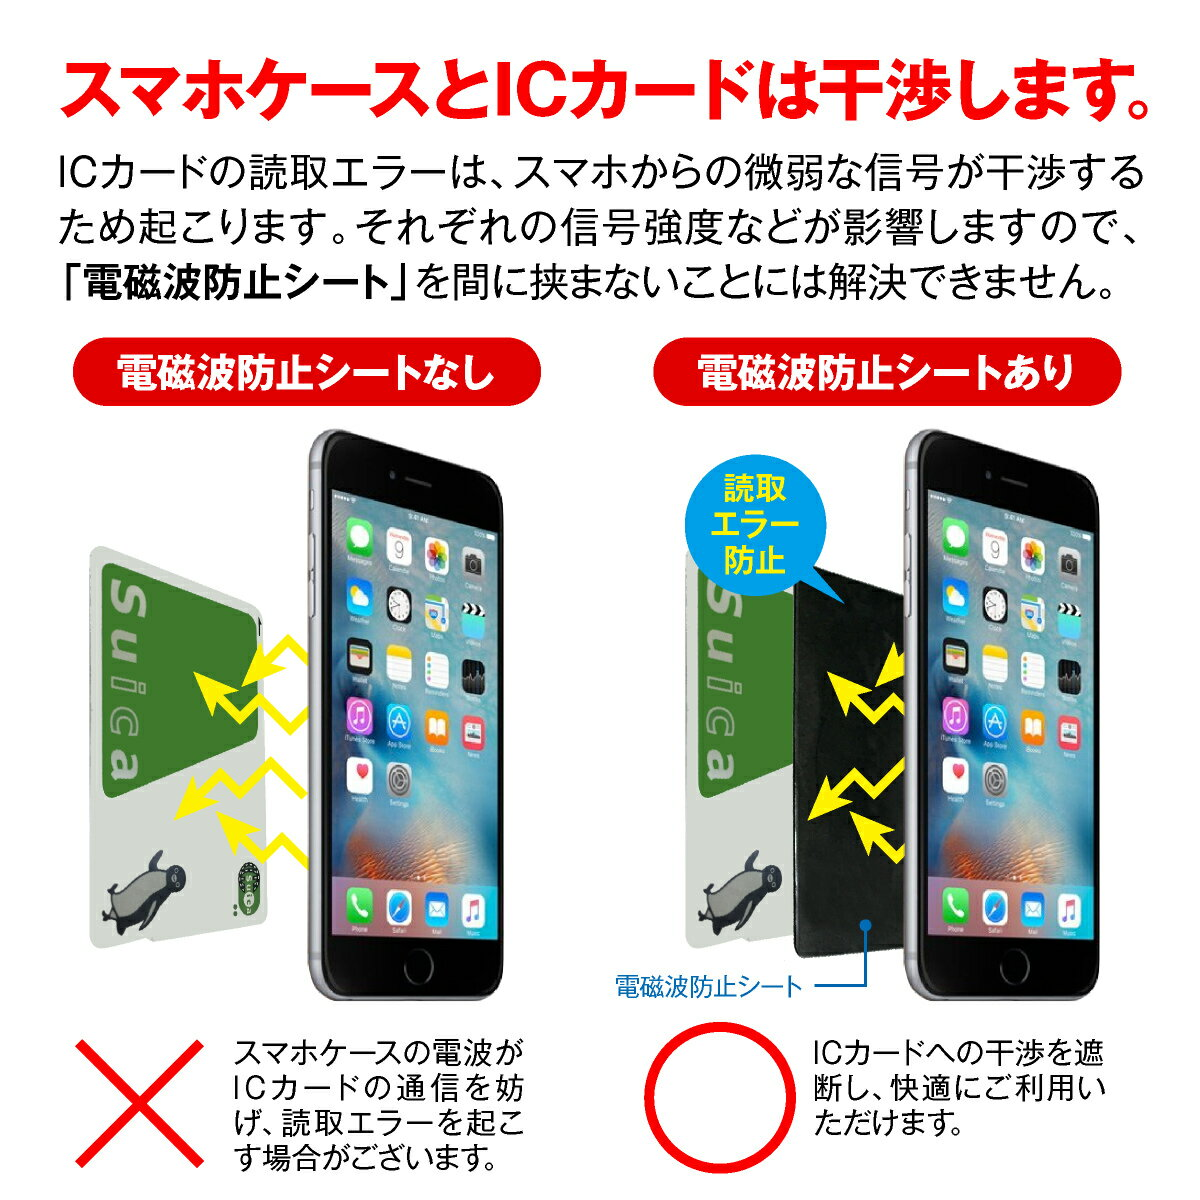 3c07cc908e51 ... iPhone XPERIA スマホケース sheet01 · TK-JIANG